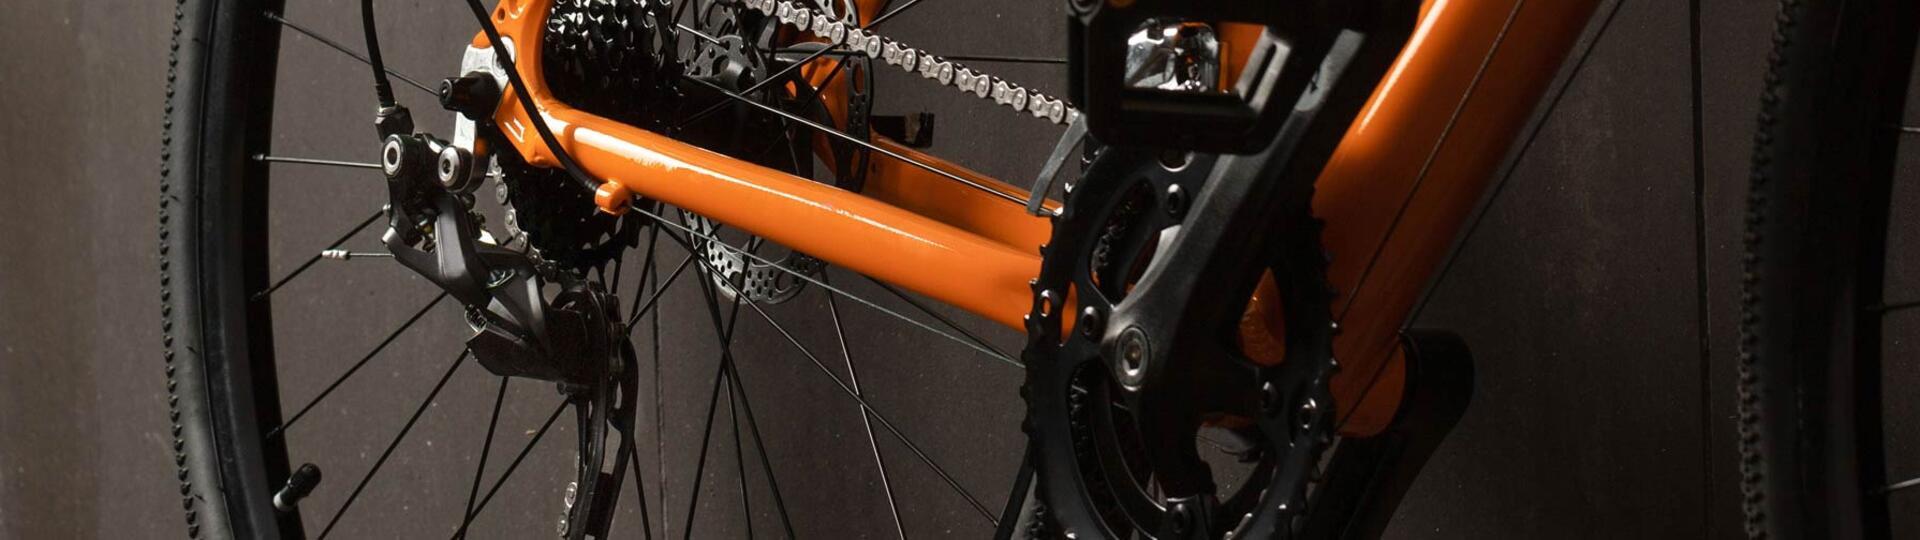 cycling.oxygenhotel it percorsi-gravel-bike-rimini 014